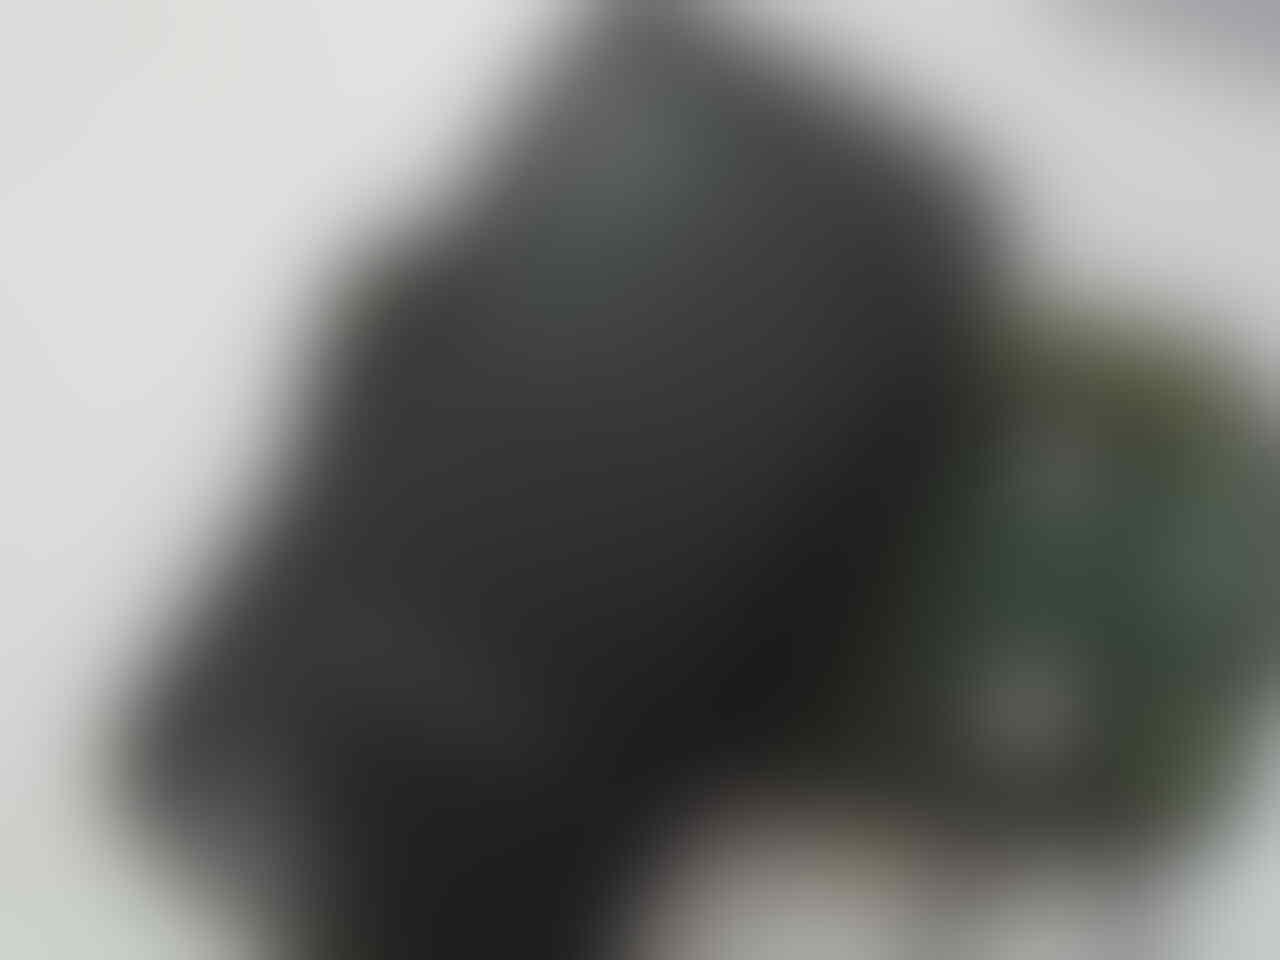 Samsung Galaxy Gio Gt-s5660 Mulus Normal Solo